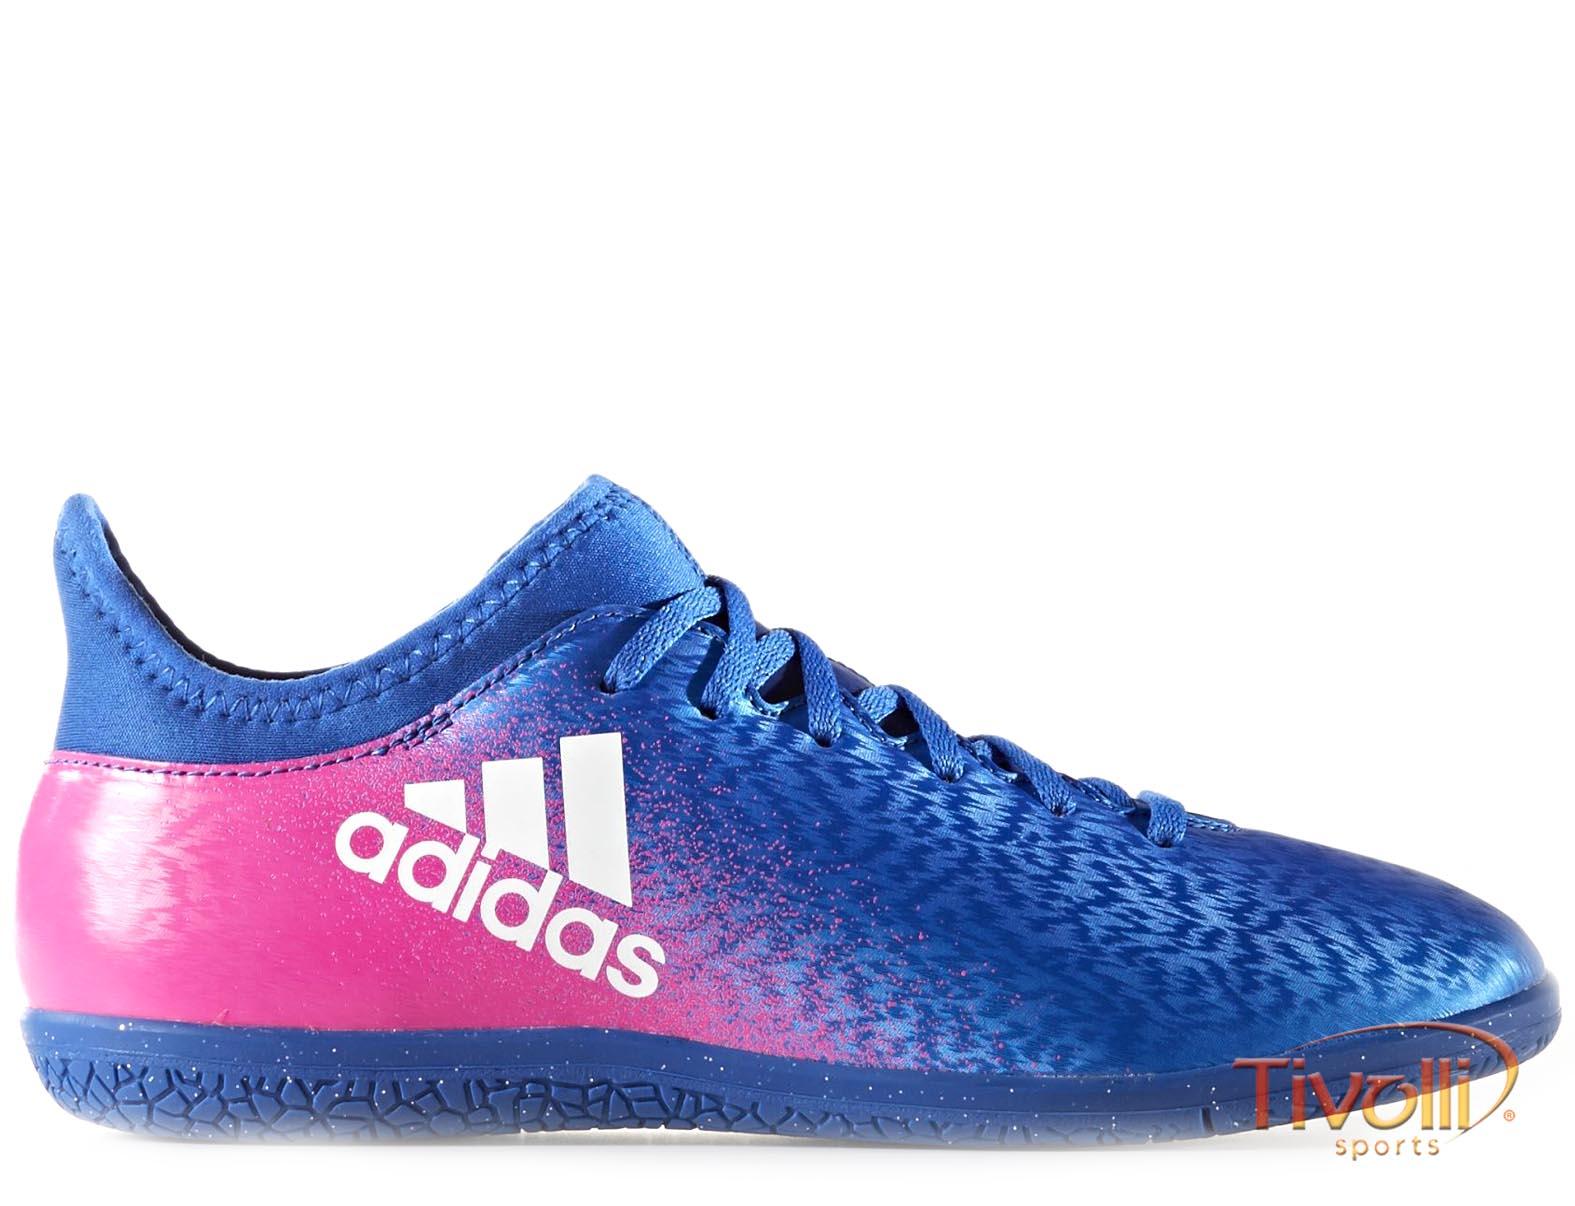 c341e9e6d7001 Chuteira Adidas Infantil X 16.3 IC Futsal